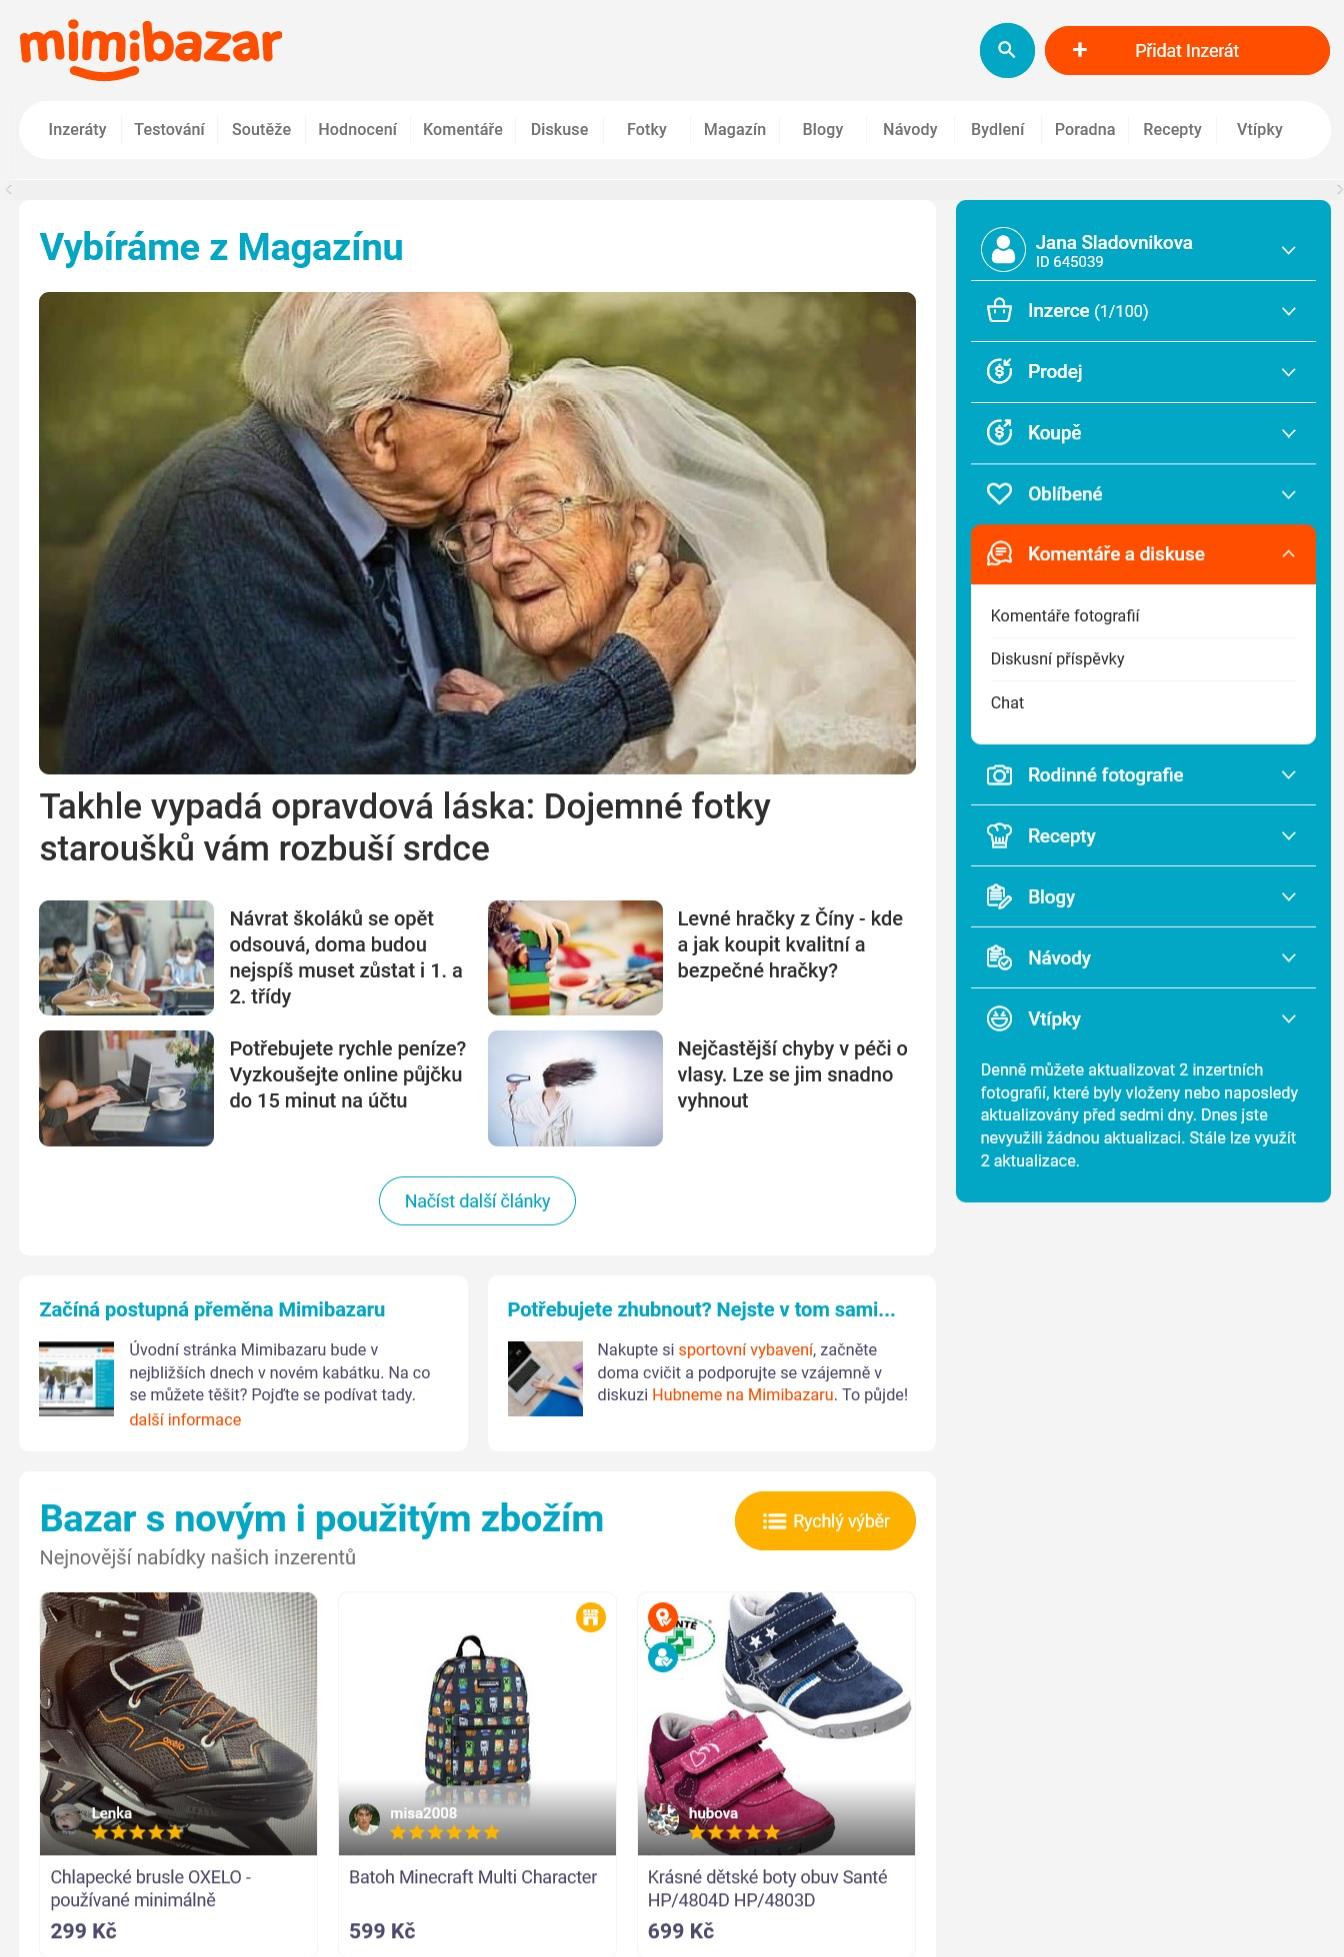 Nová podoba webu Mimibazar